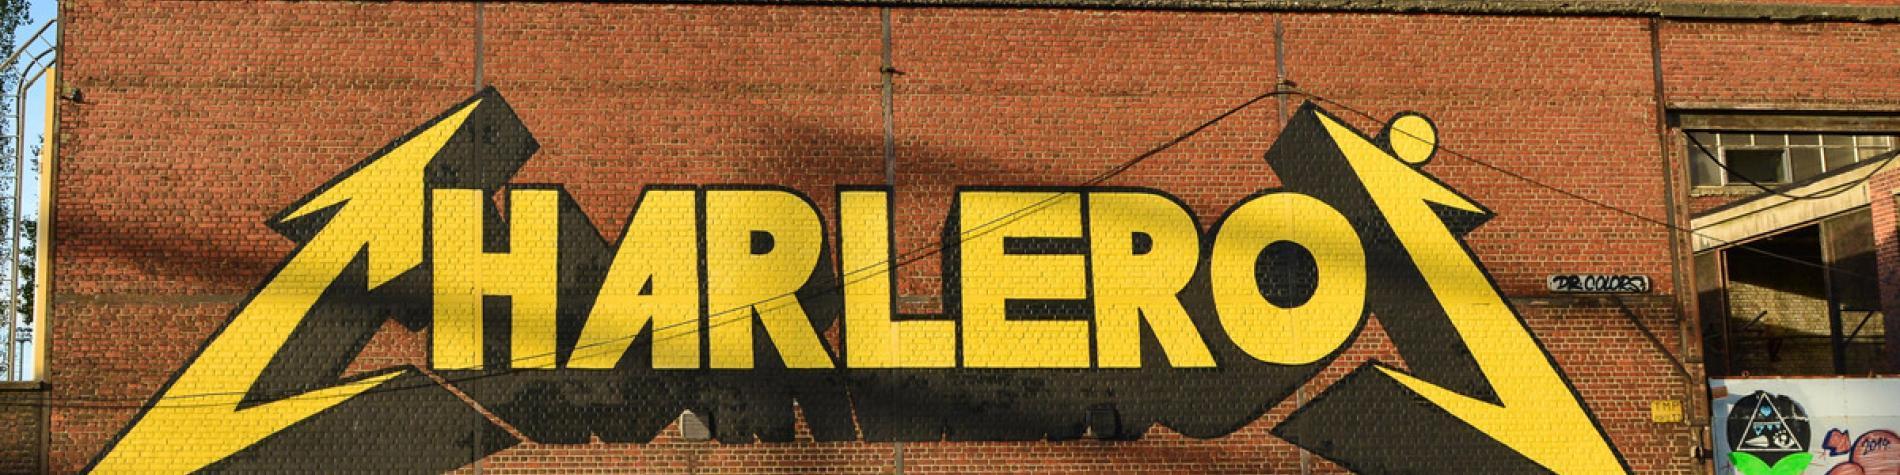 Charleroi street art - Discover Belgium